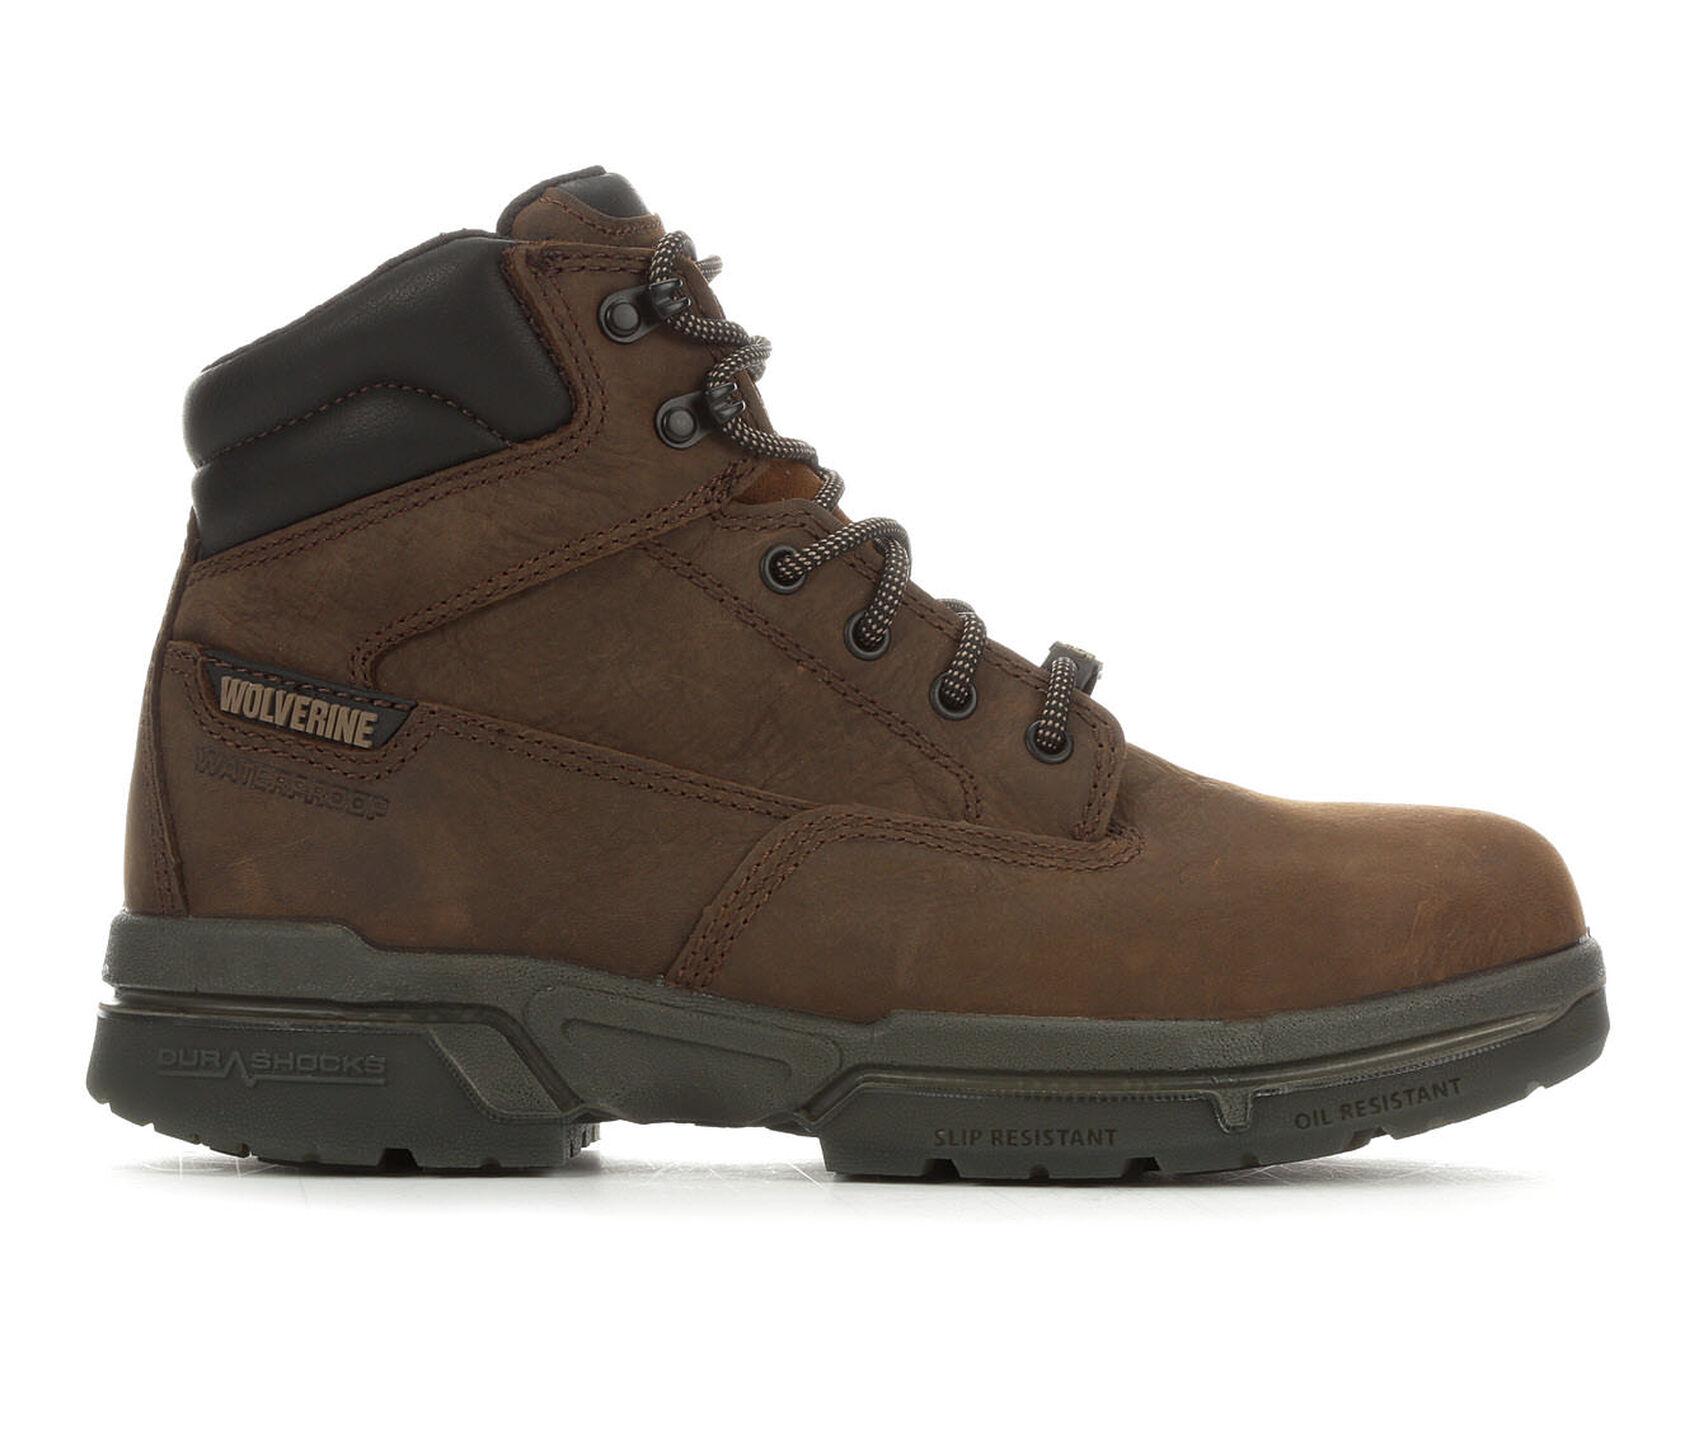 8e48a8e685b Men's Wolverine I-80 Durashock Steel Toe Work Boots | Shoe Carnival